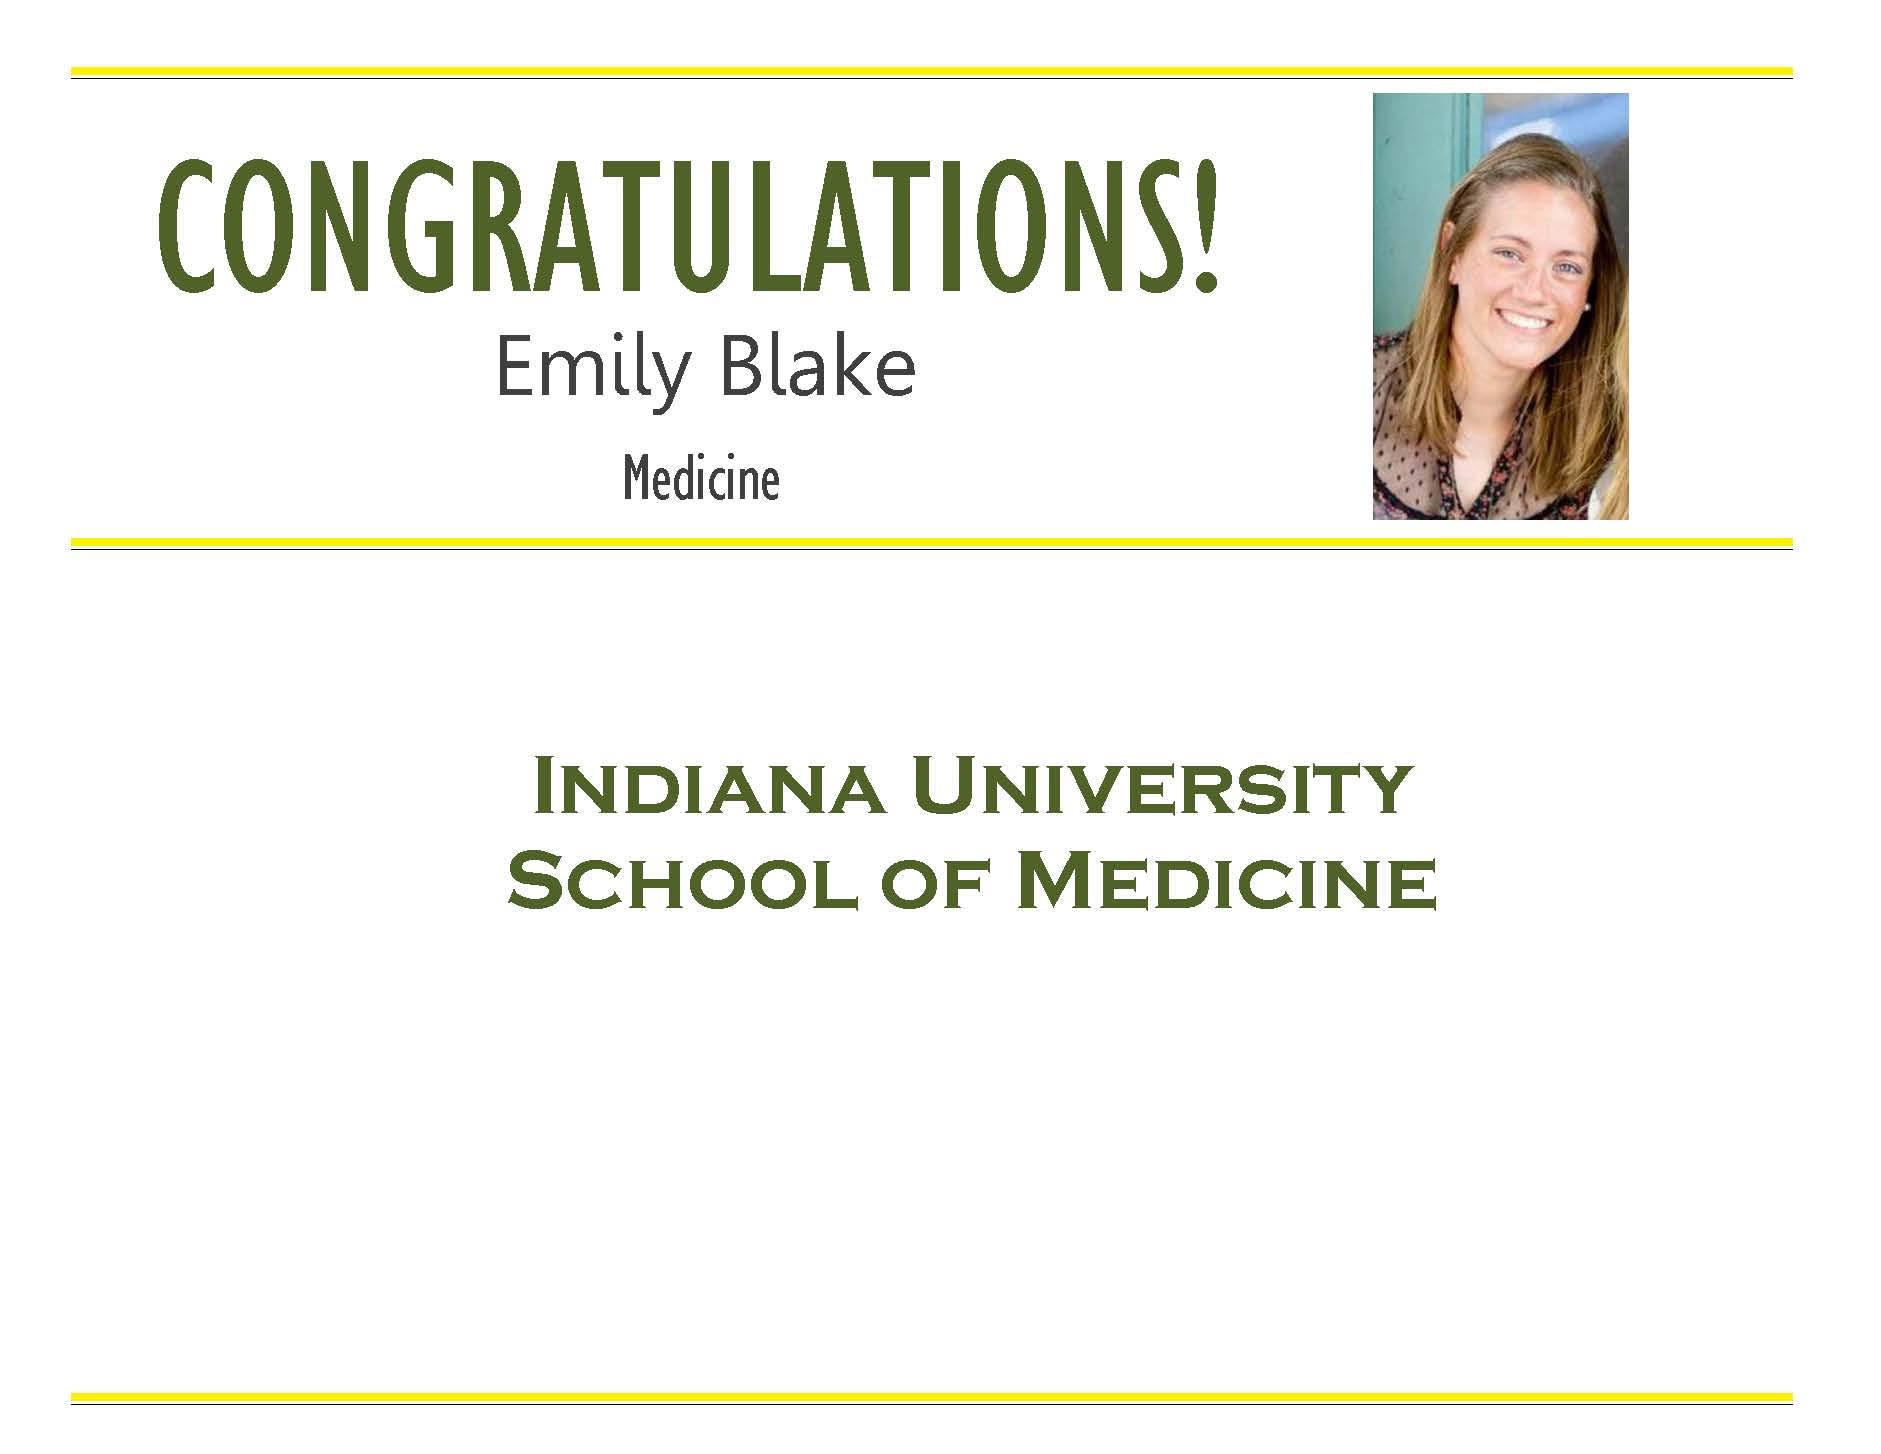 Emily Blake.jpg